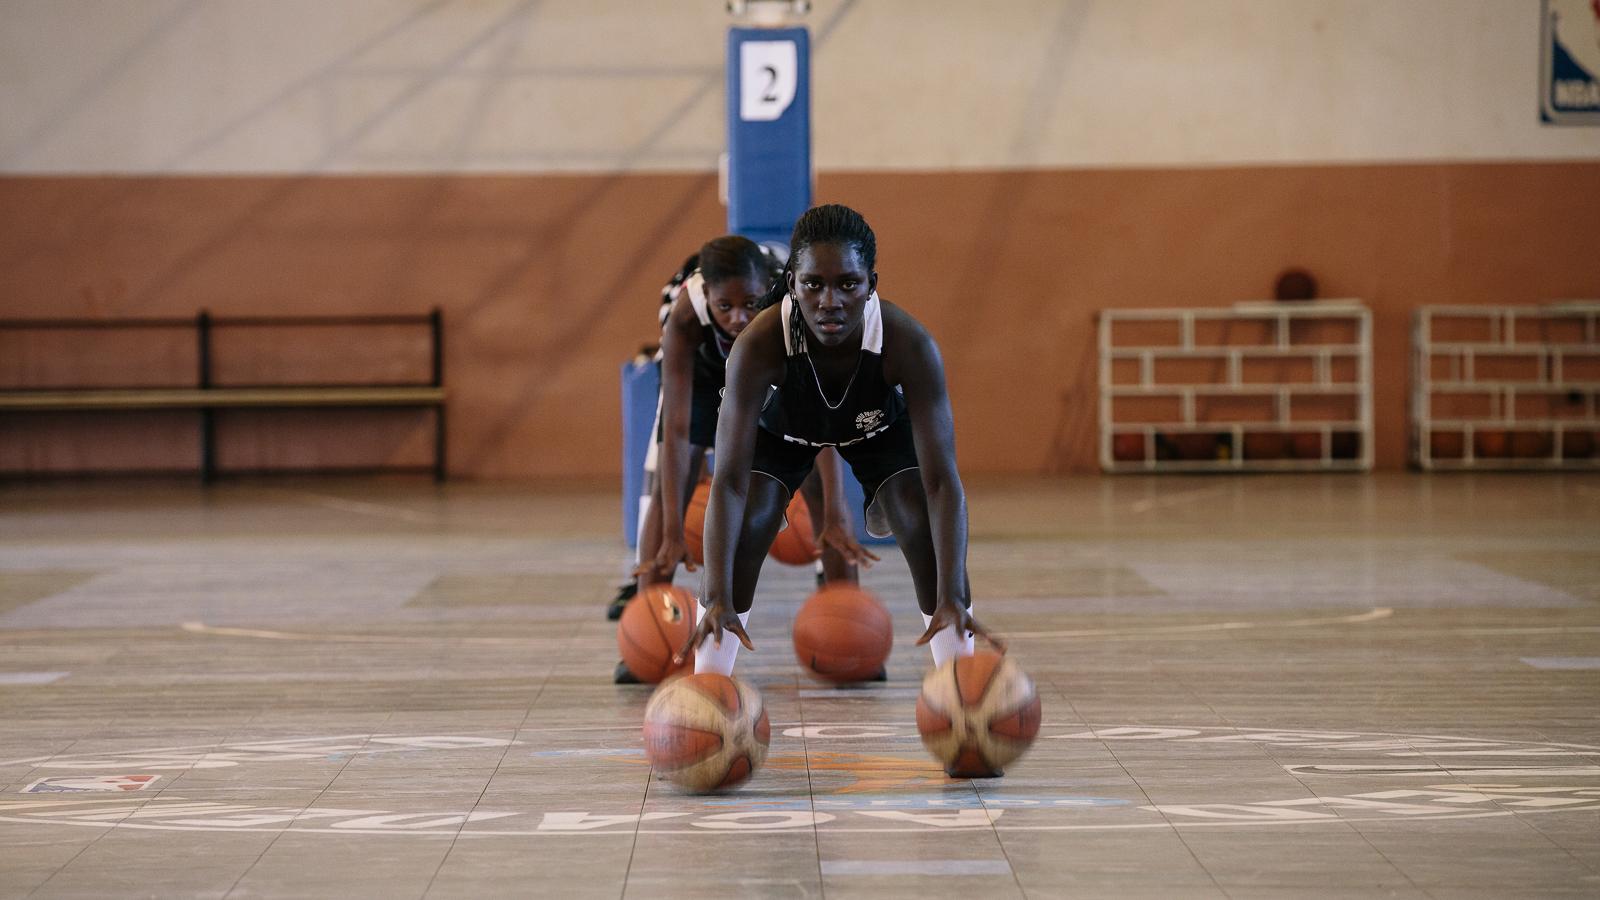 0066_20150529_Seed Academy_Thiès_Senegal©KevinCouliau.jpg